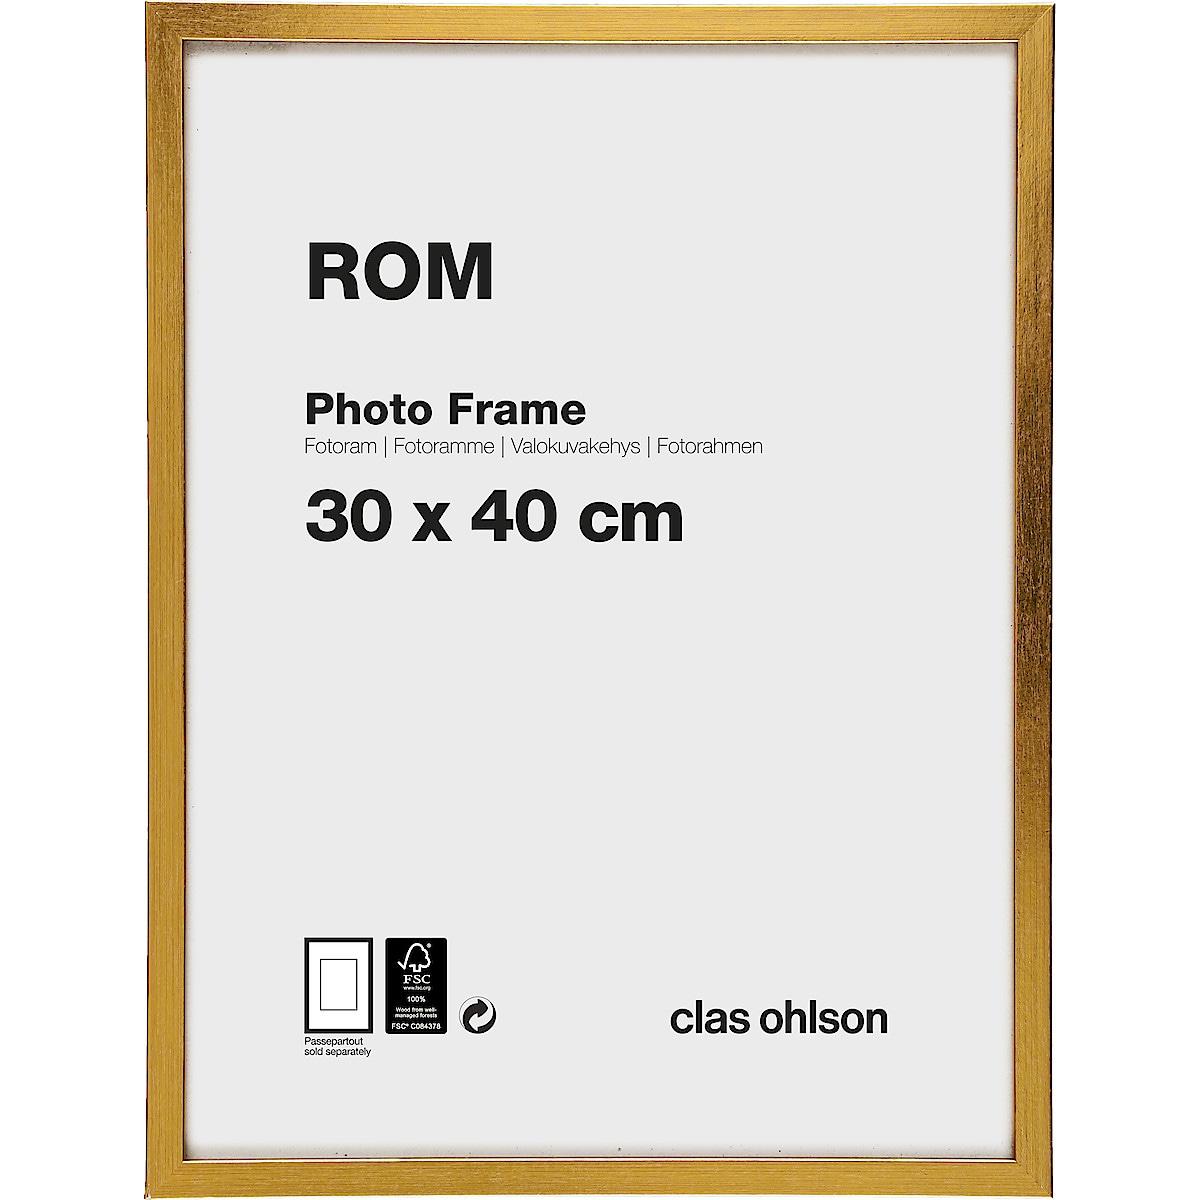 Fotoram Rom